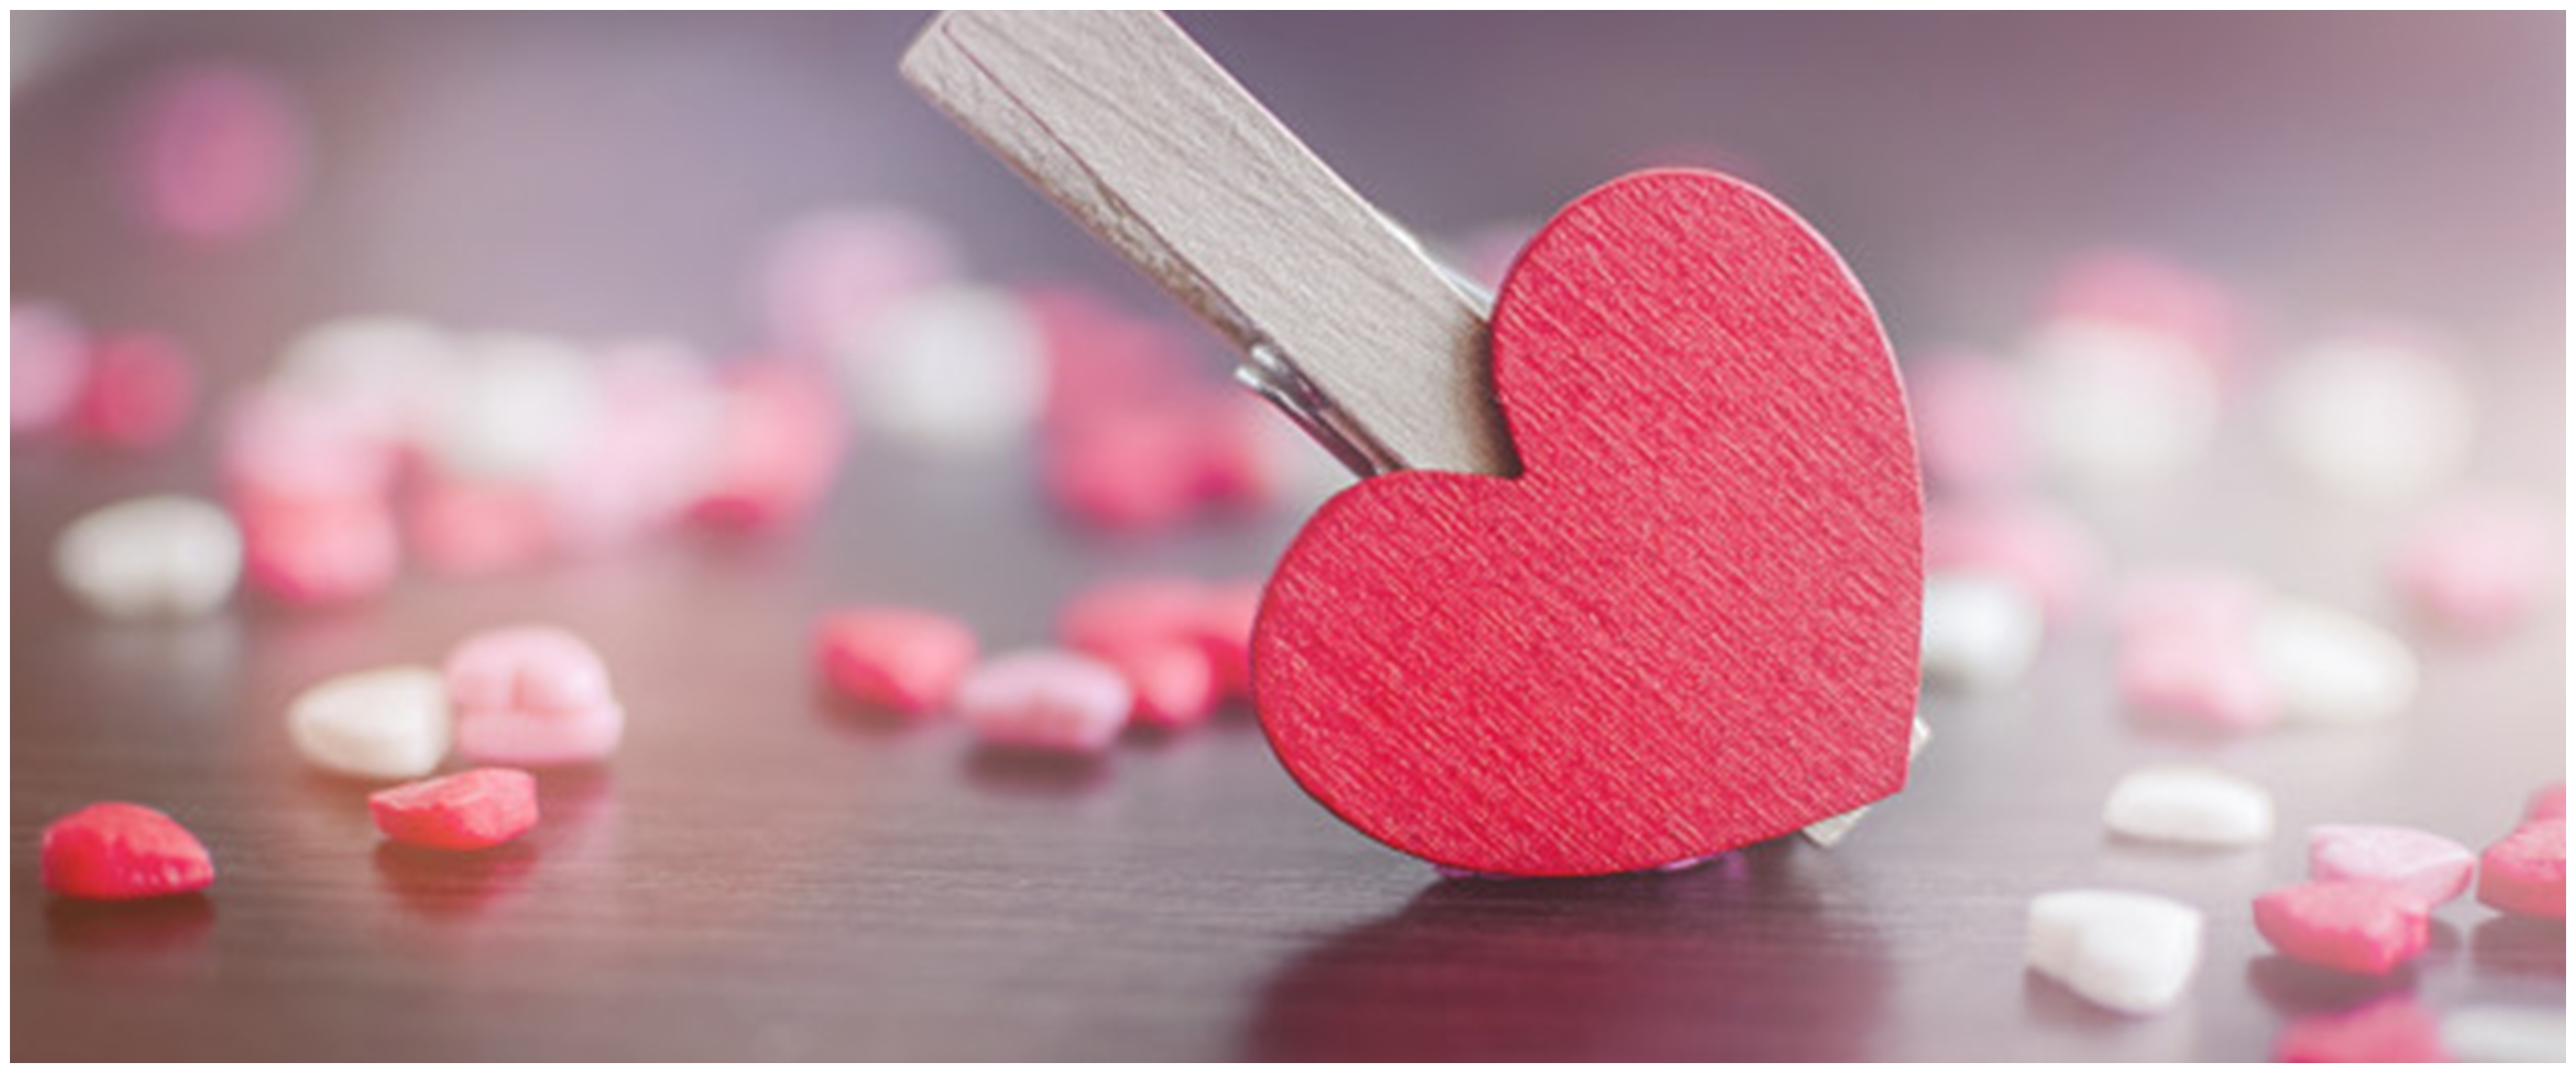 40 Quotes tentang cinta dari para tokoh terkenal, penuh makna